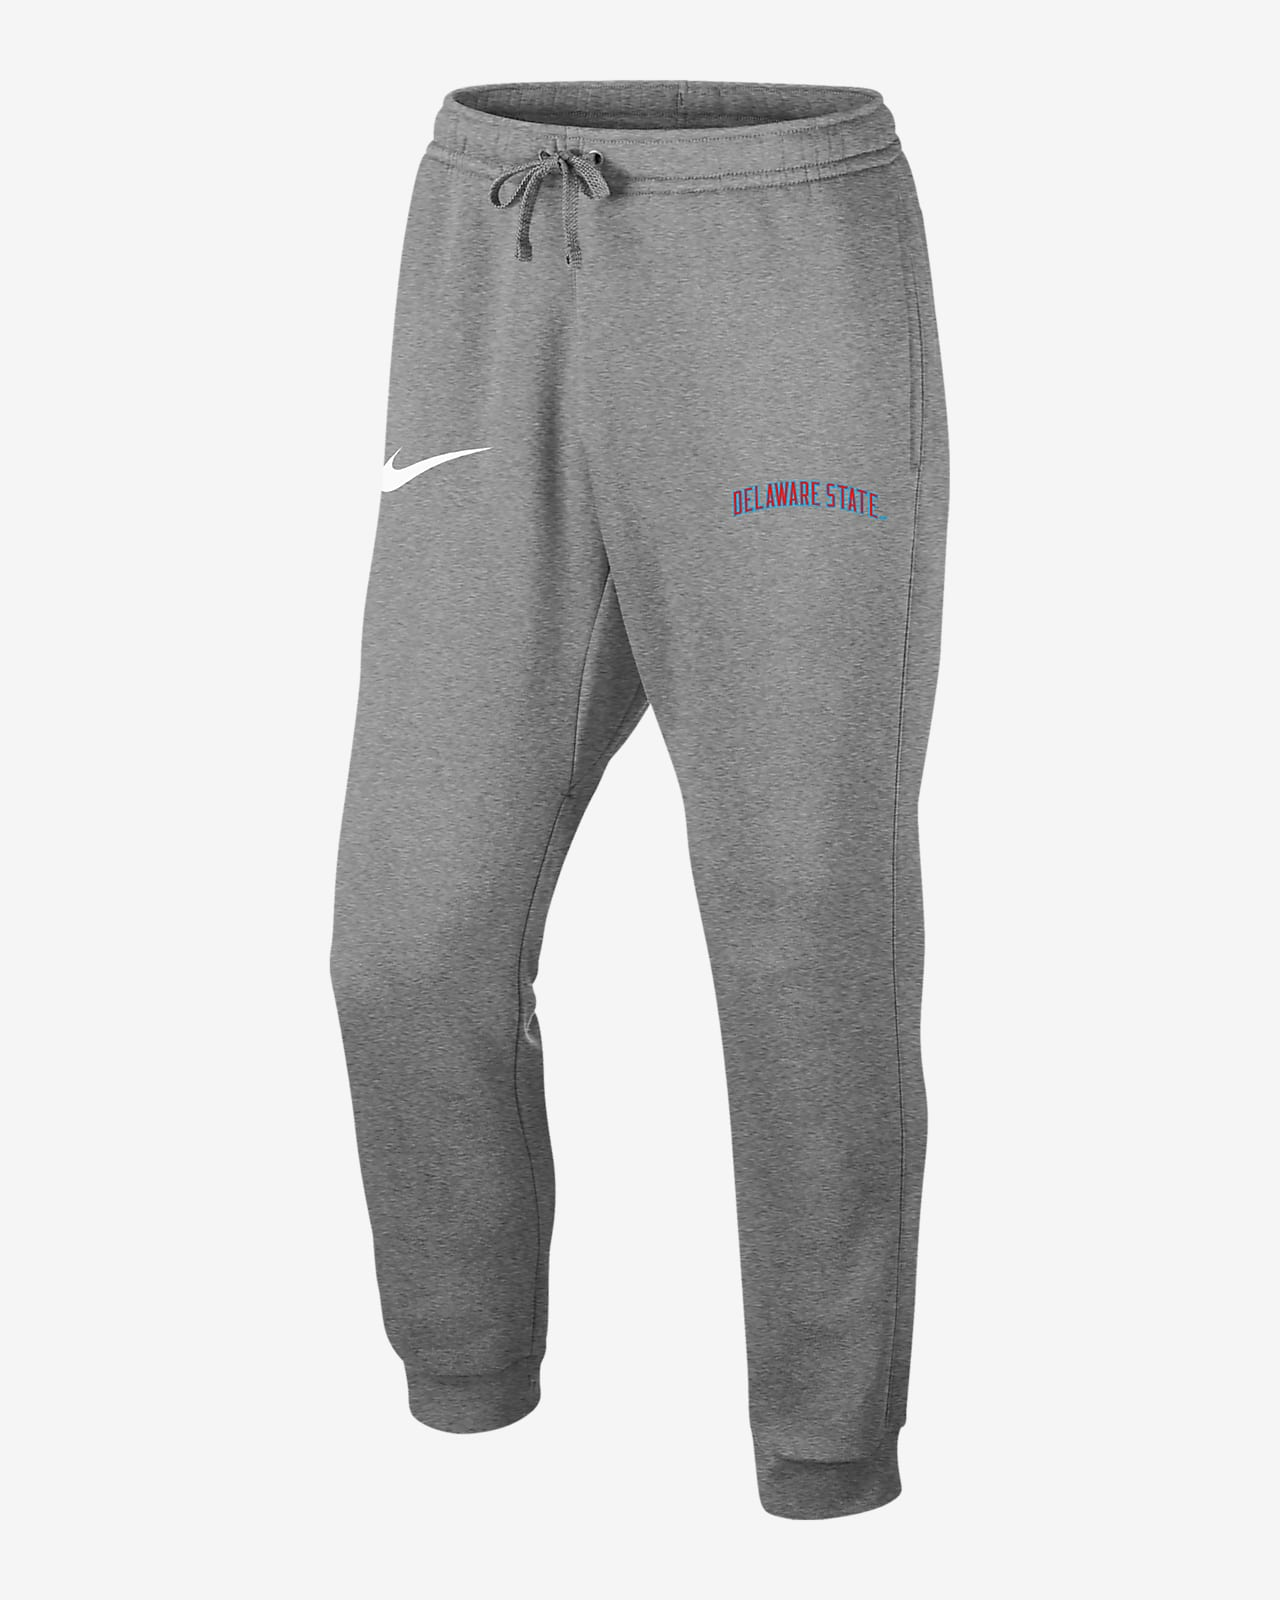 Nike College Club Fleece (Delaware State) Joggers